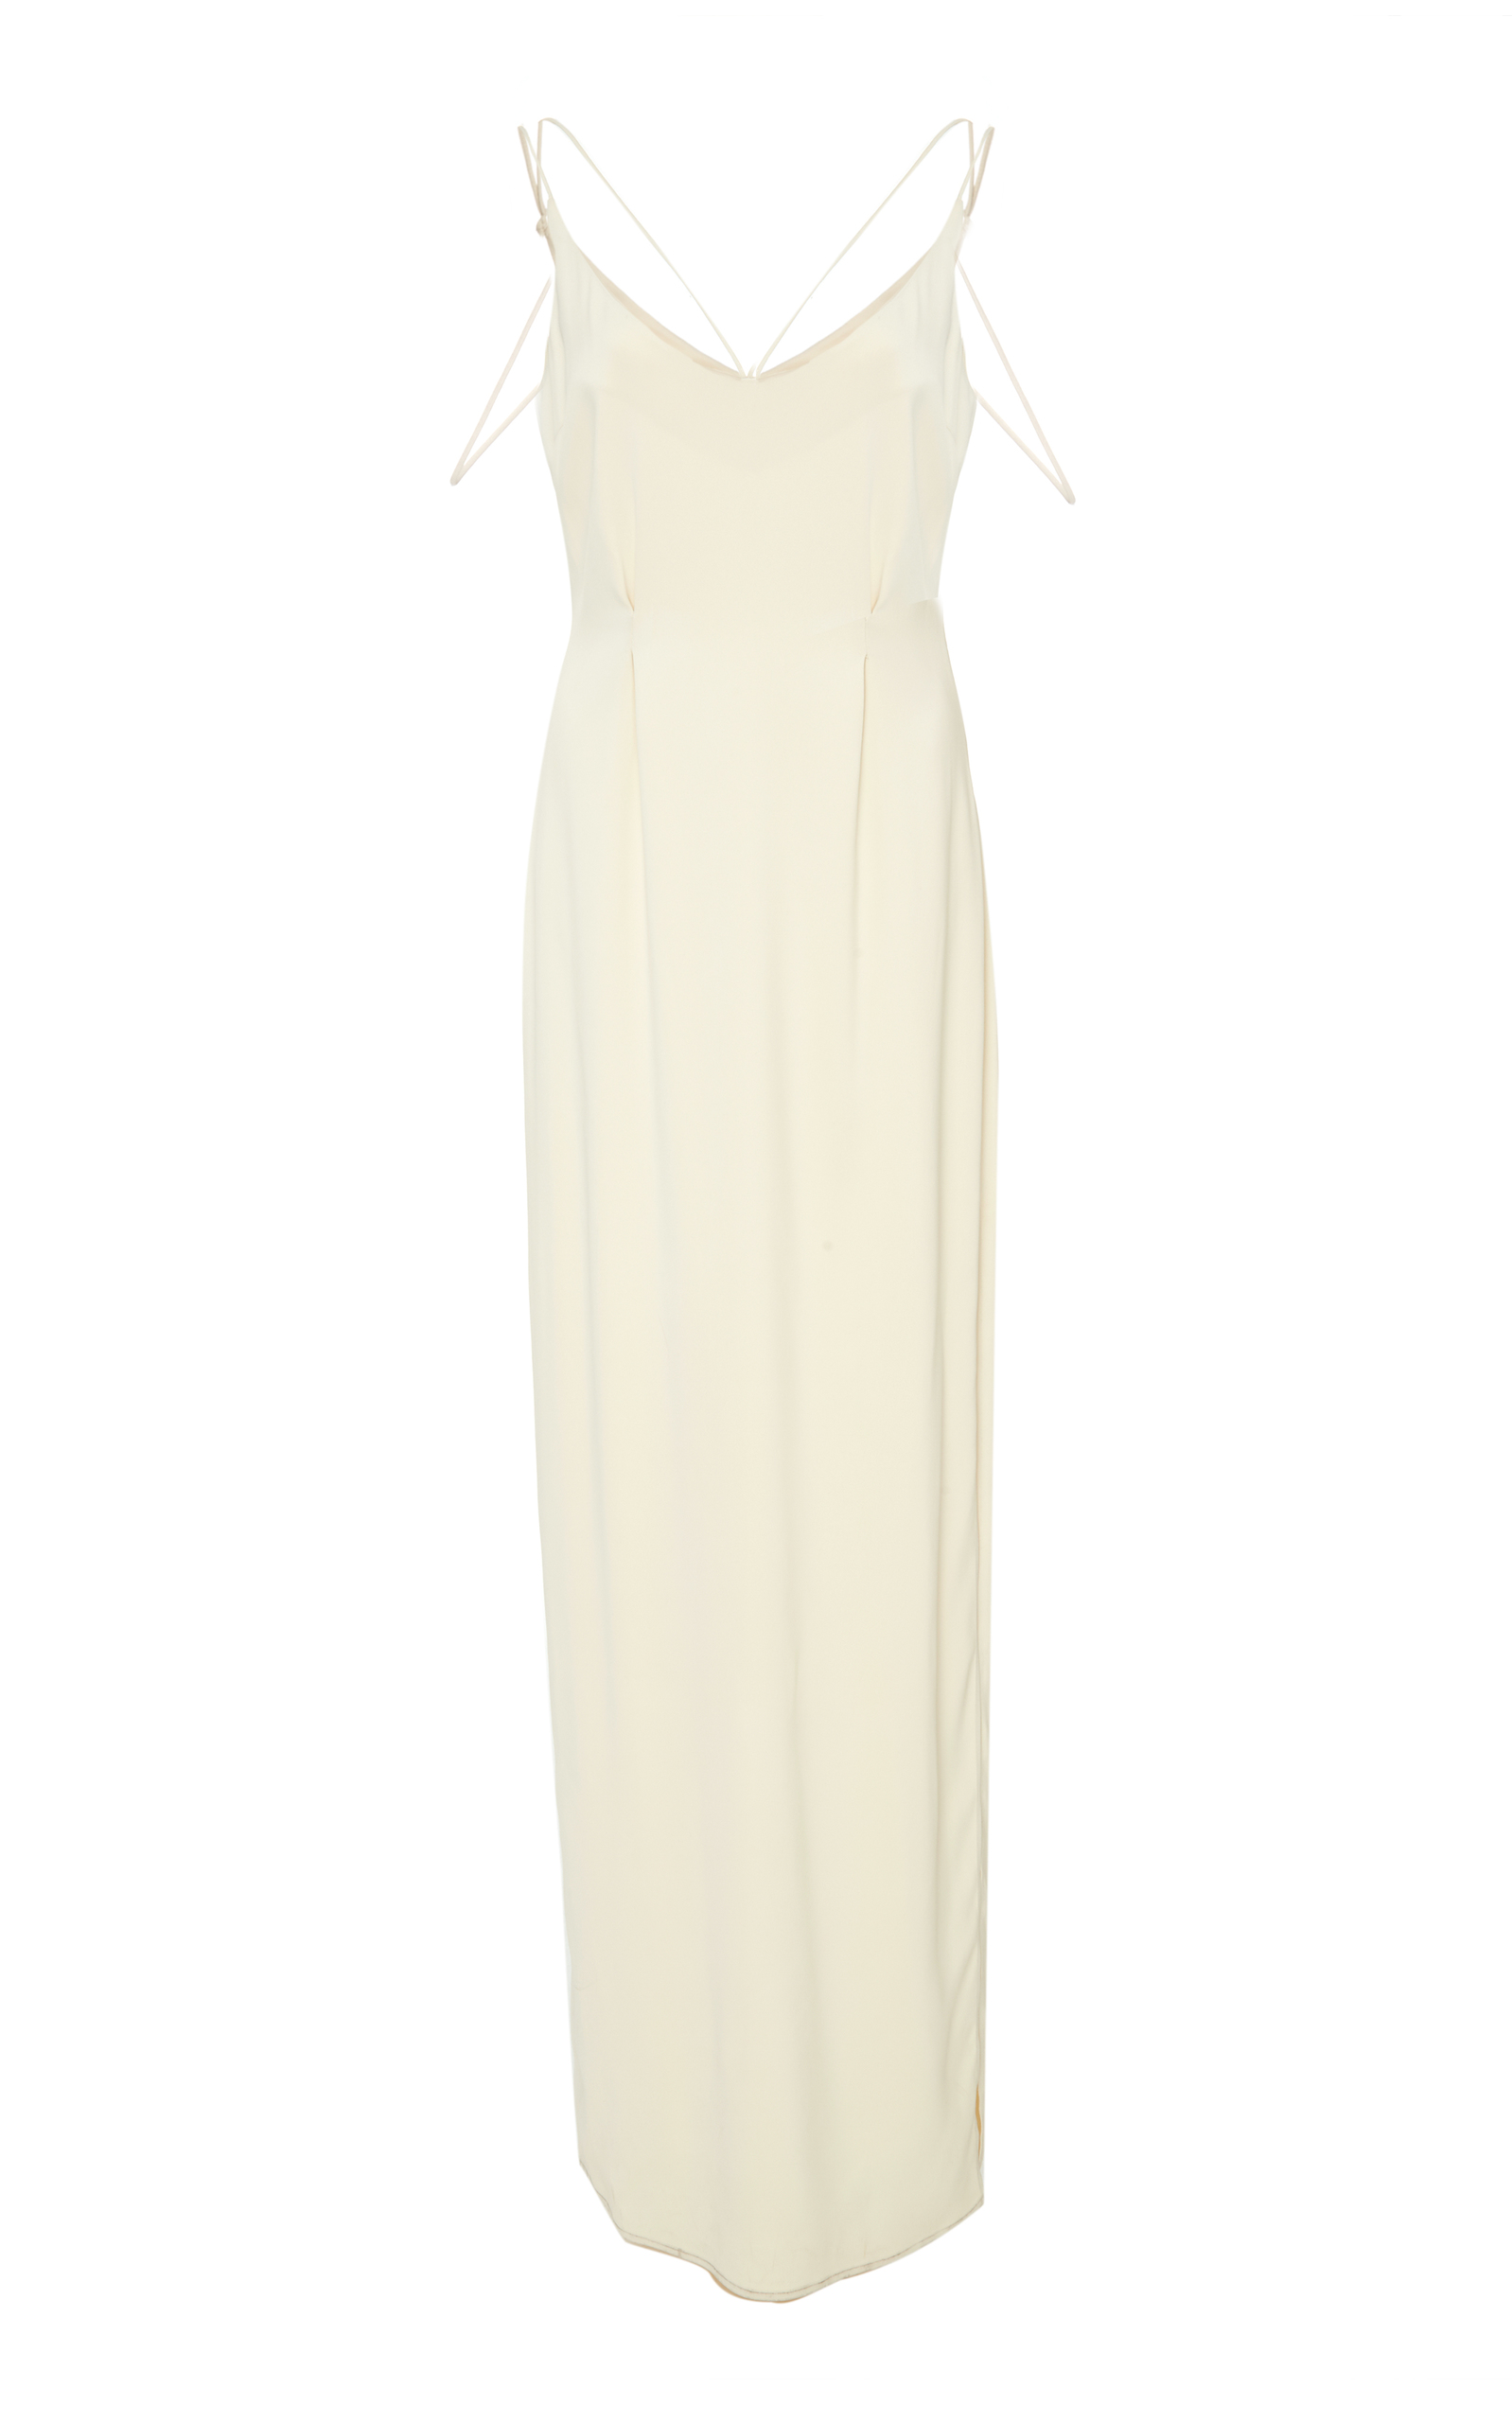 HENSELY Shoulder Strap Column Dress in White